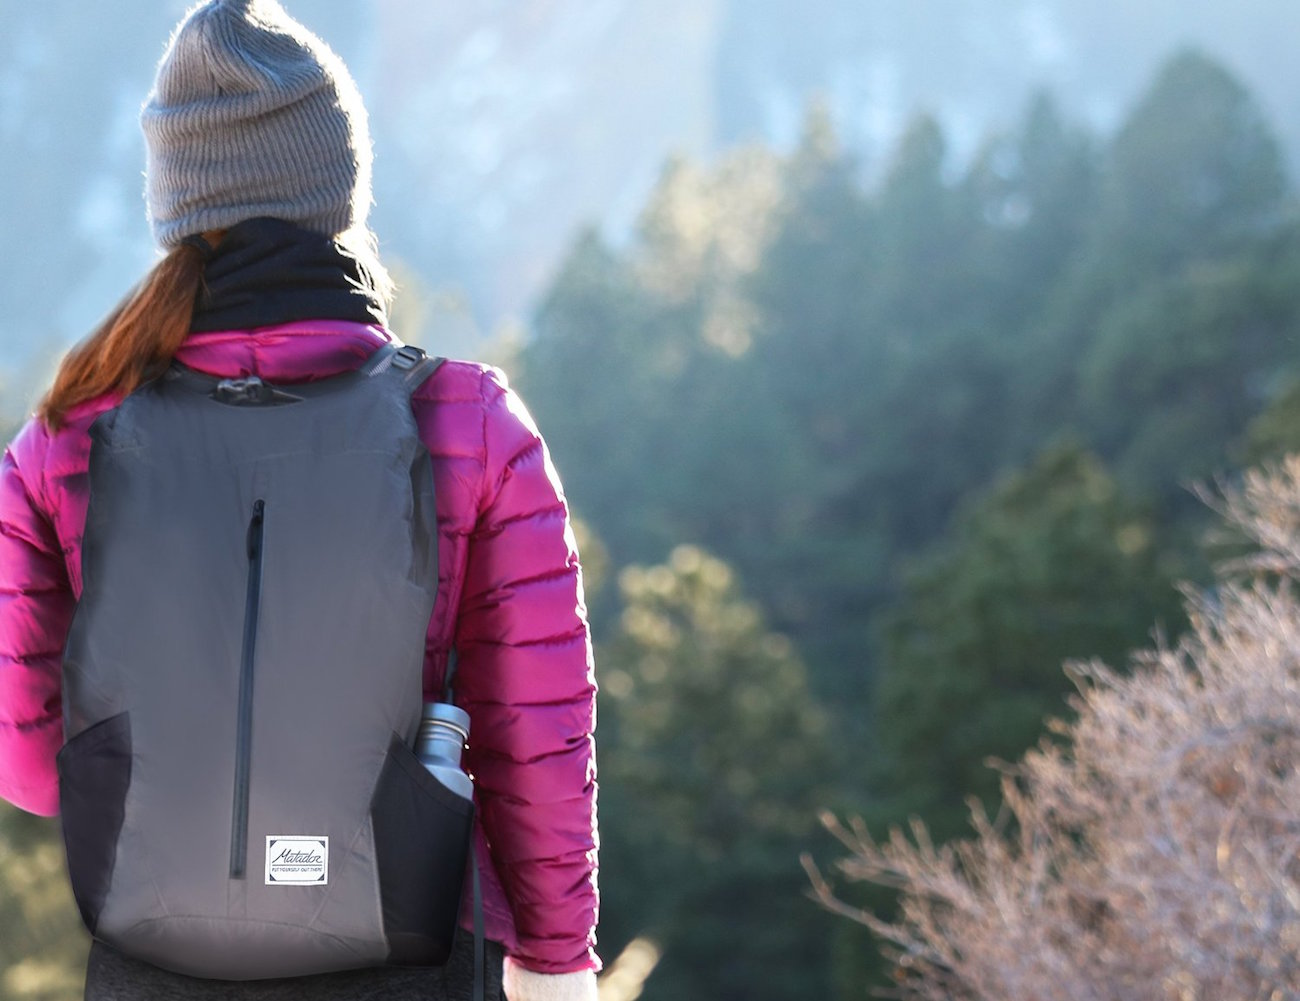 matador-freerain24-waterproof-backpack-01